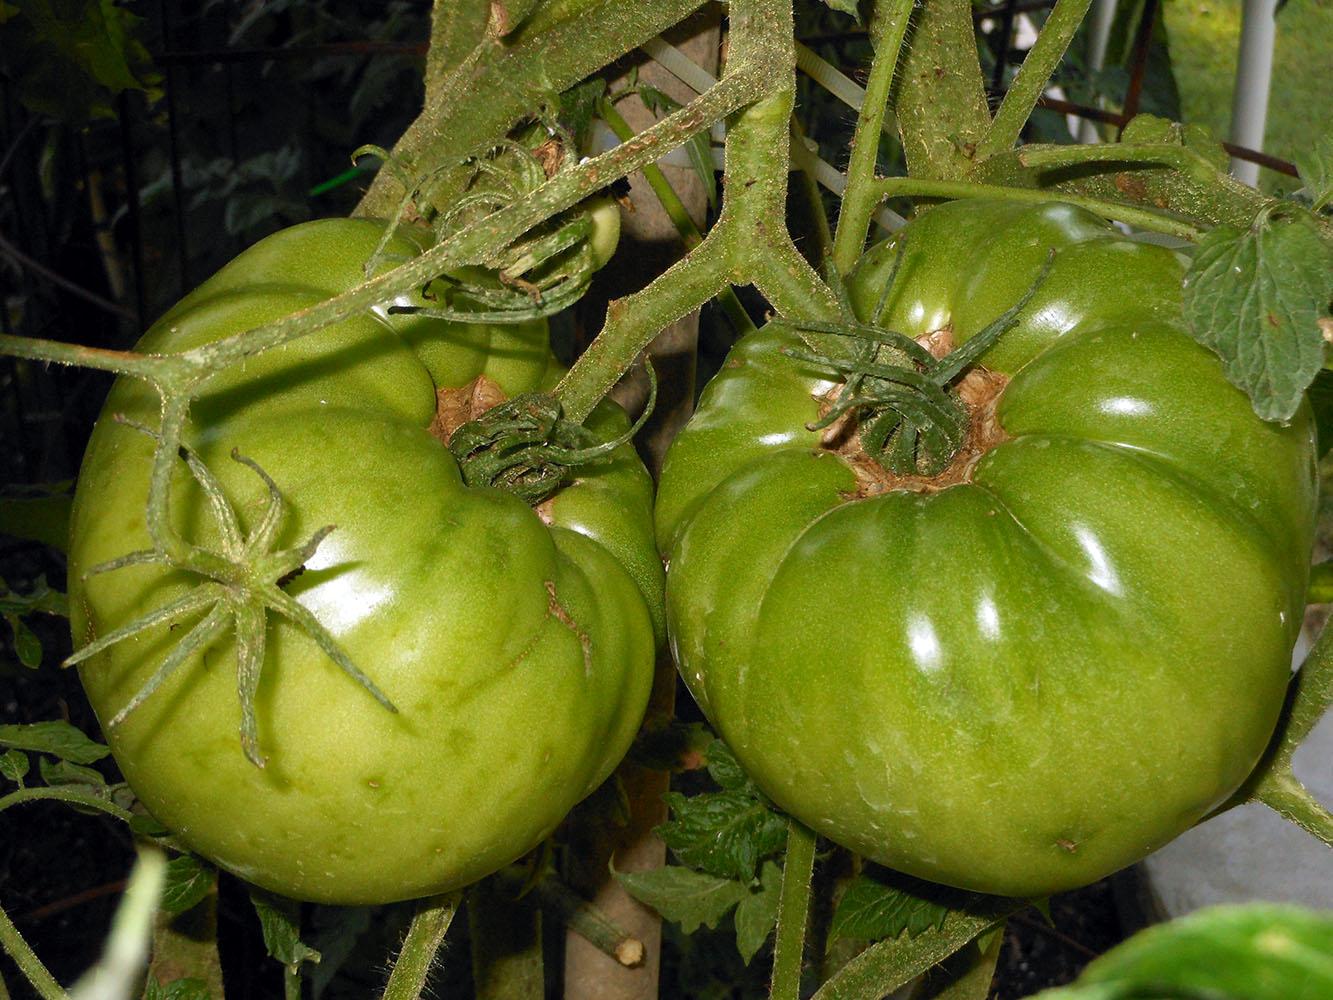 06-25-2015 Garden 02 Better Boy Tomatoes 01